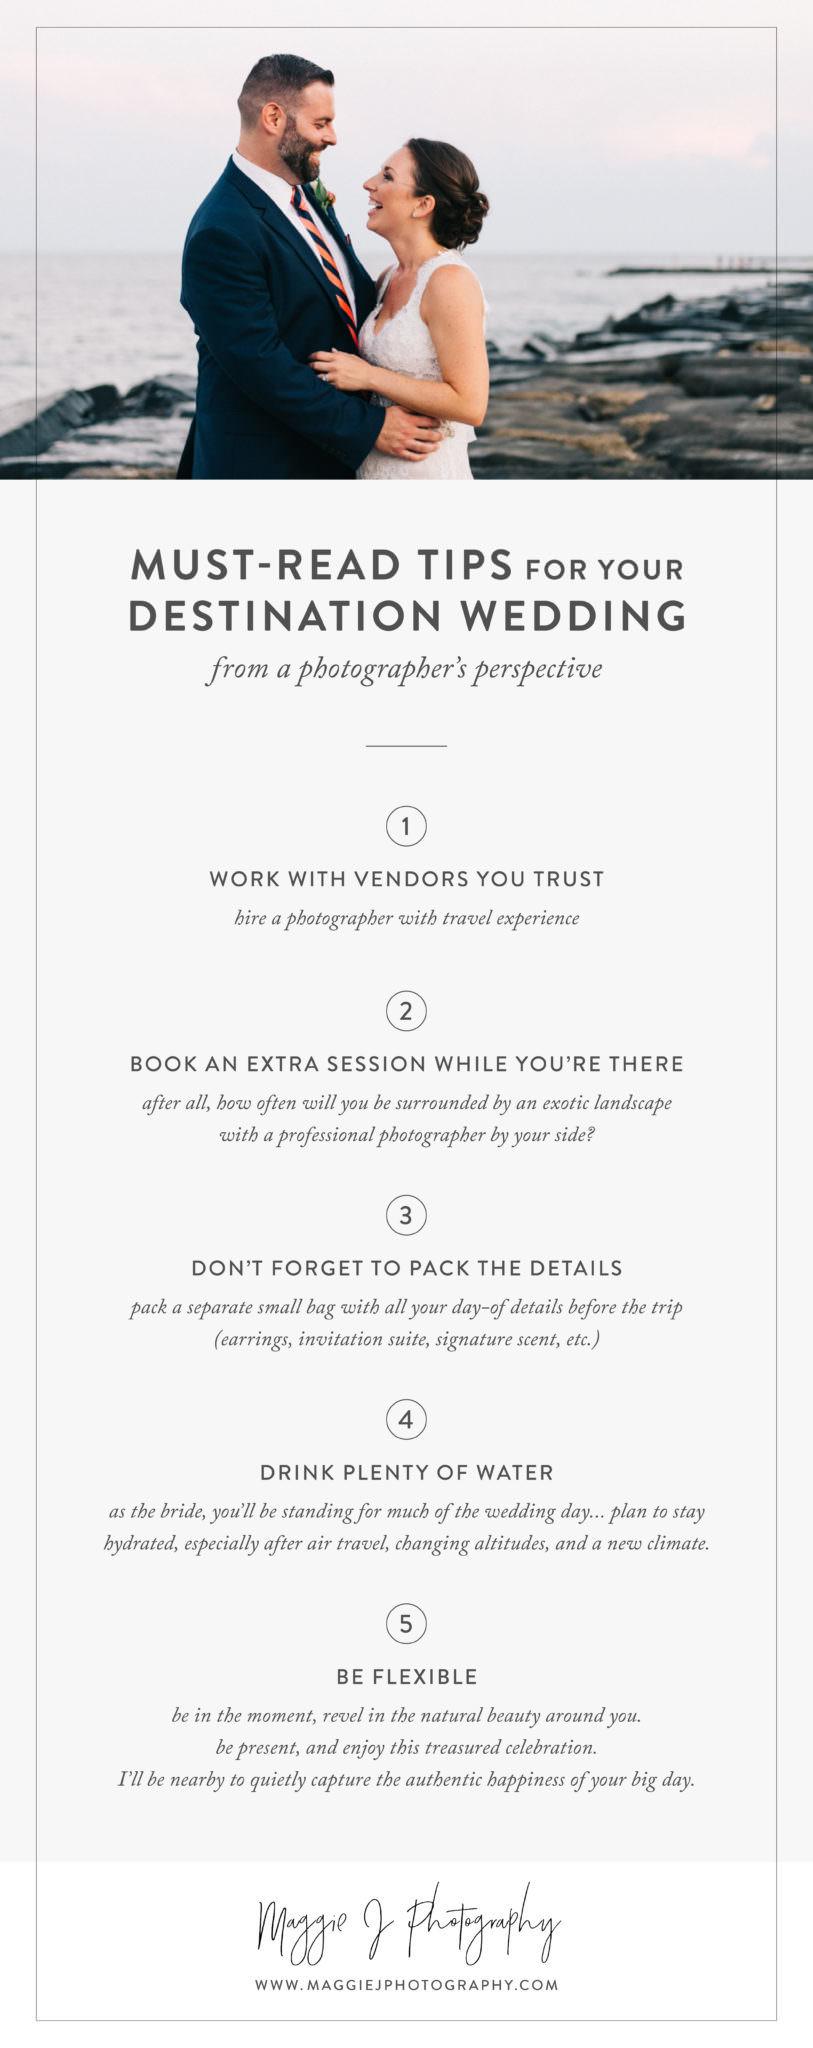 Pennsylvania Destination Wedding Photographer | Maggie J Photography